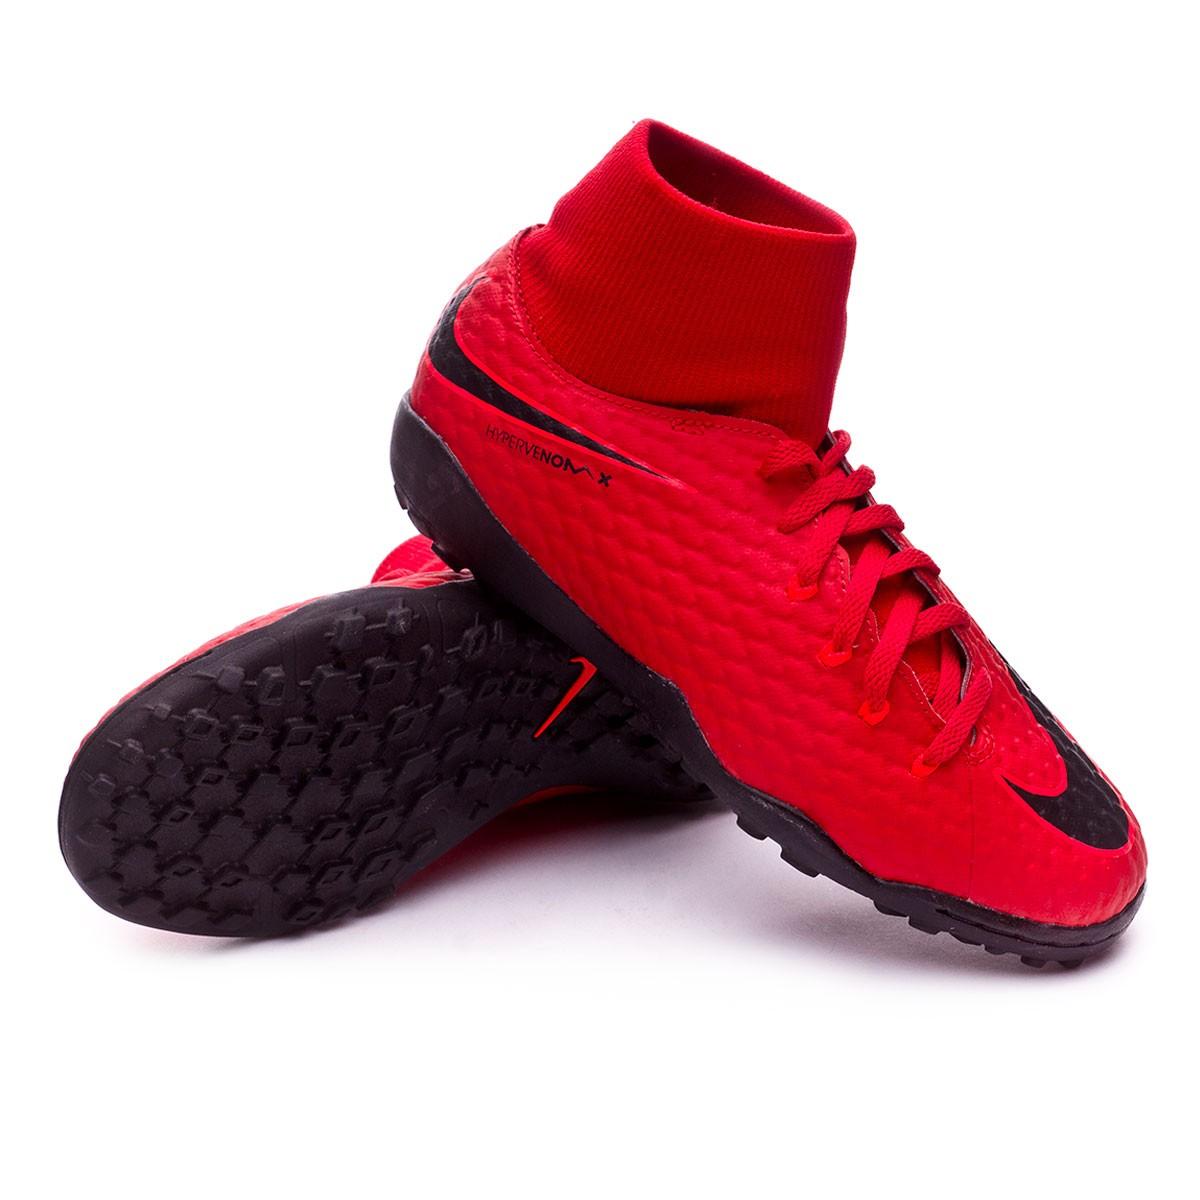 Zapatilla Nike HypervenomX Phelon III DF Turf Niño University red-Black-Bright  crimson - Leaked soccer 0e6353dd02e50